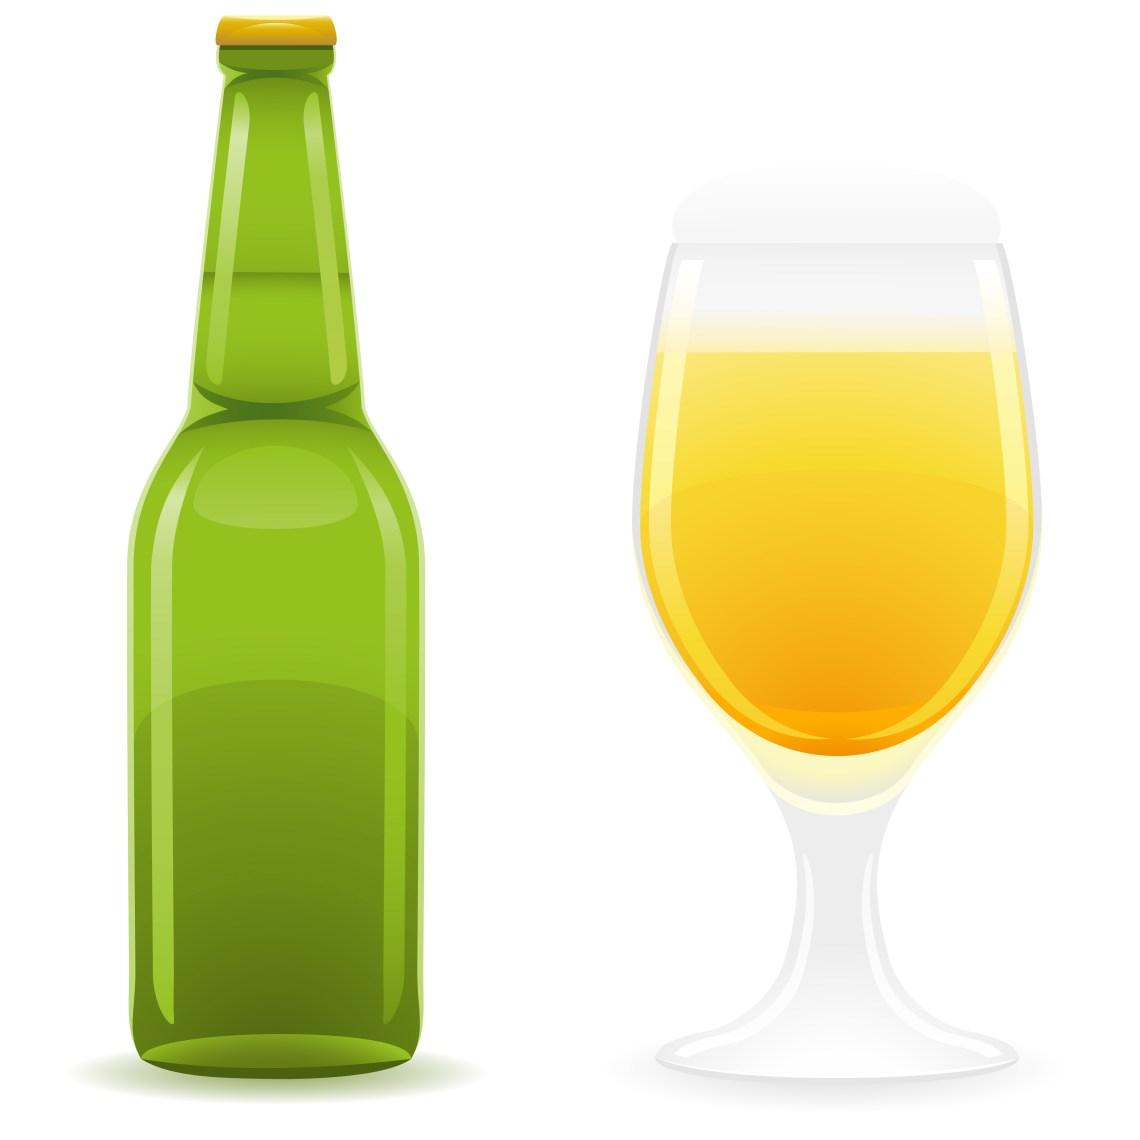 Download beer bottle and glass vector illustration - Download Free ...